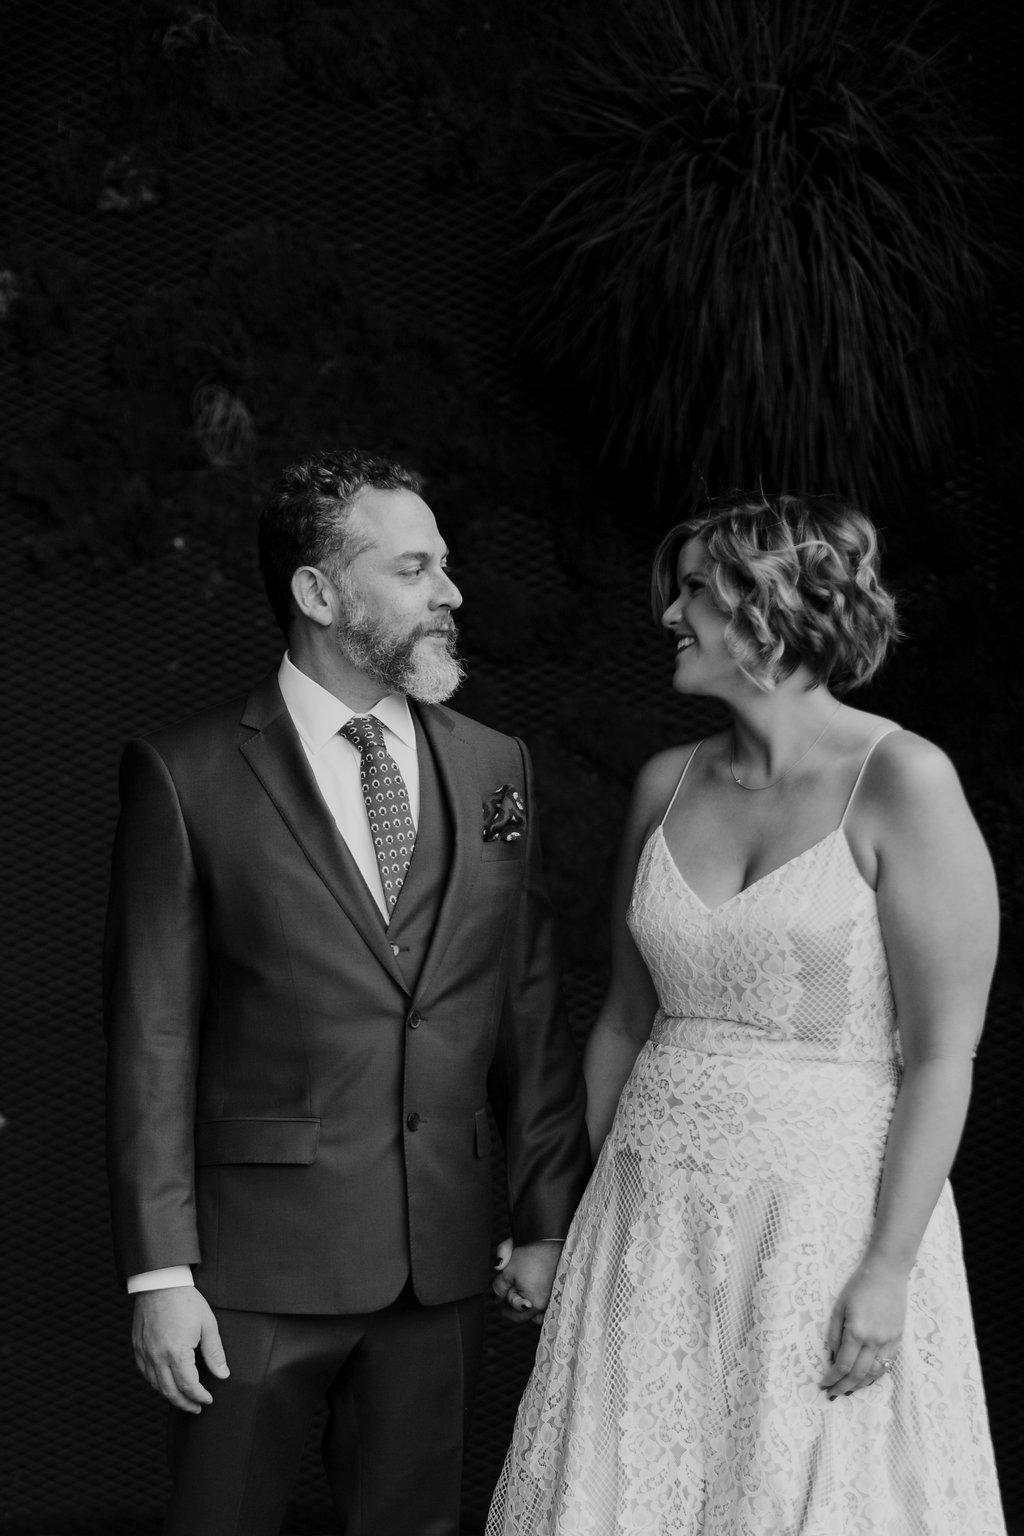 Paige-Newton-Intimate-Wedding-Photographer-Malverde-Wedding-Photography0023.jpg